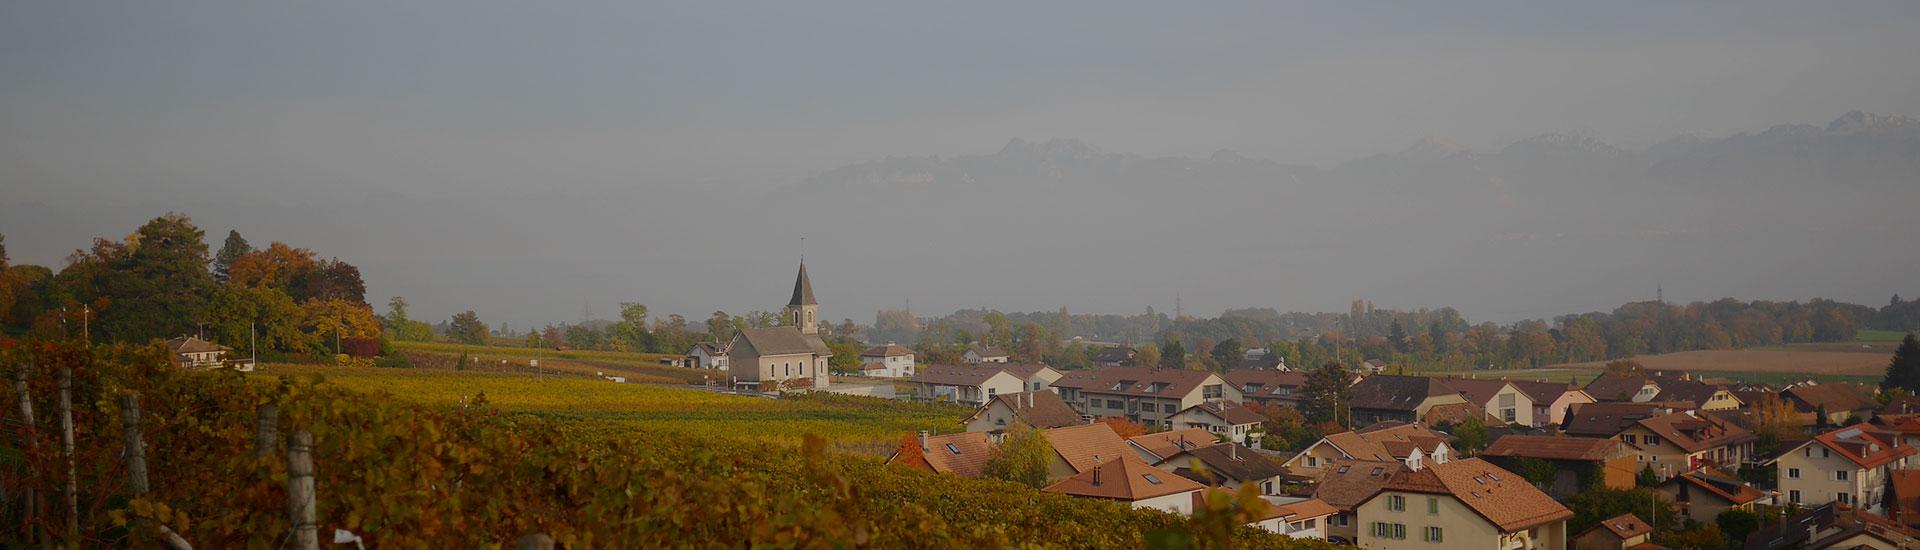 Le Village de Gilly Auberge de Gilly